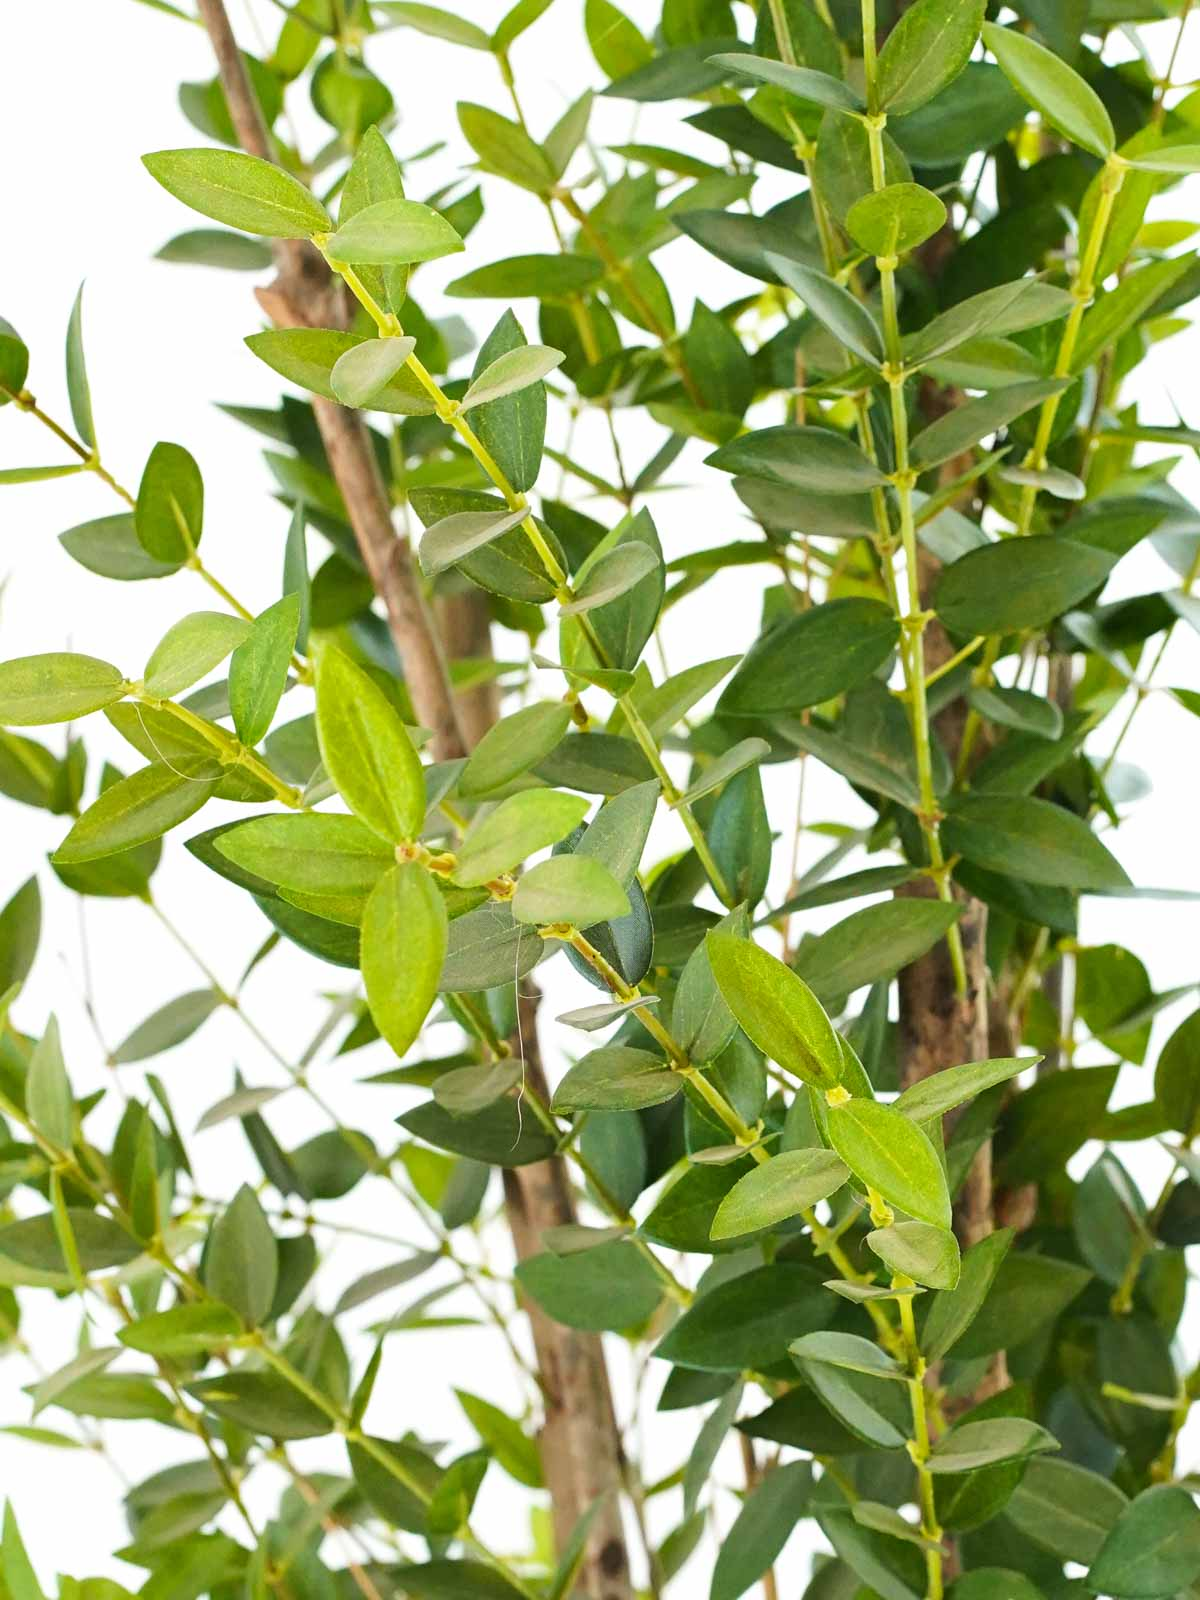 Meucalyptus Tree Small Artificial Plants Trees